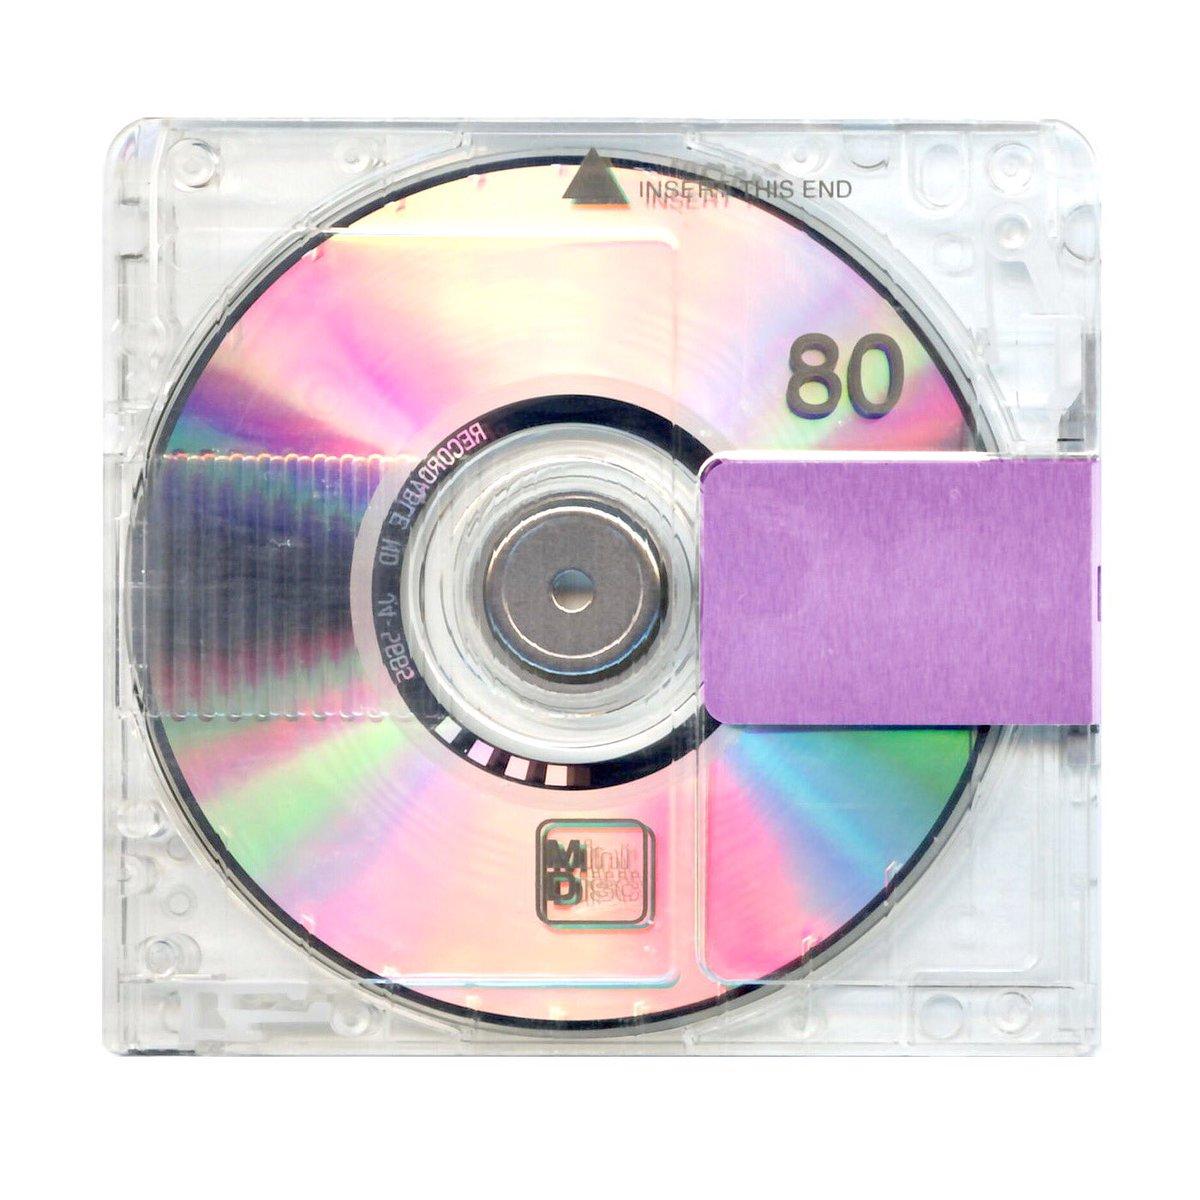 YANDHI Kanye West